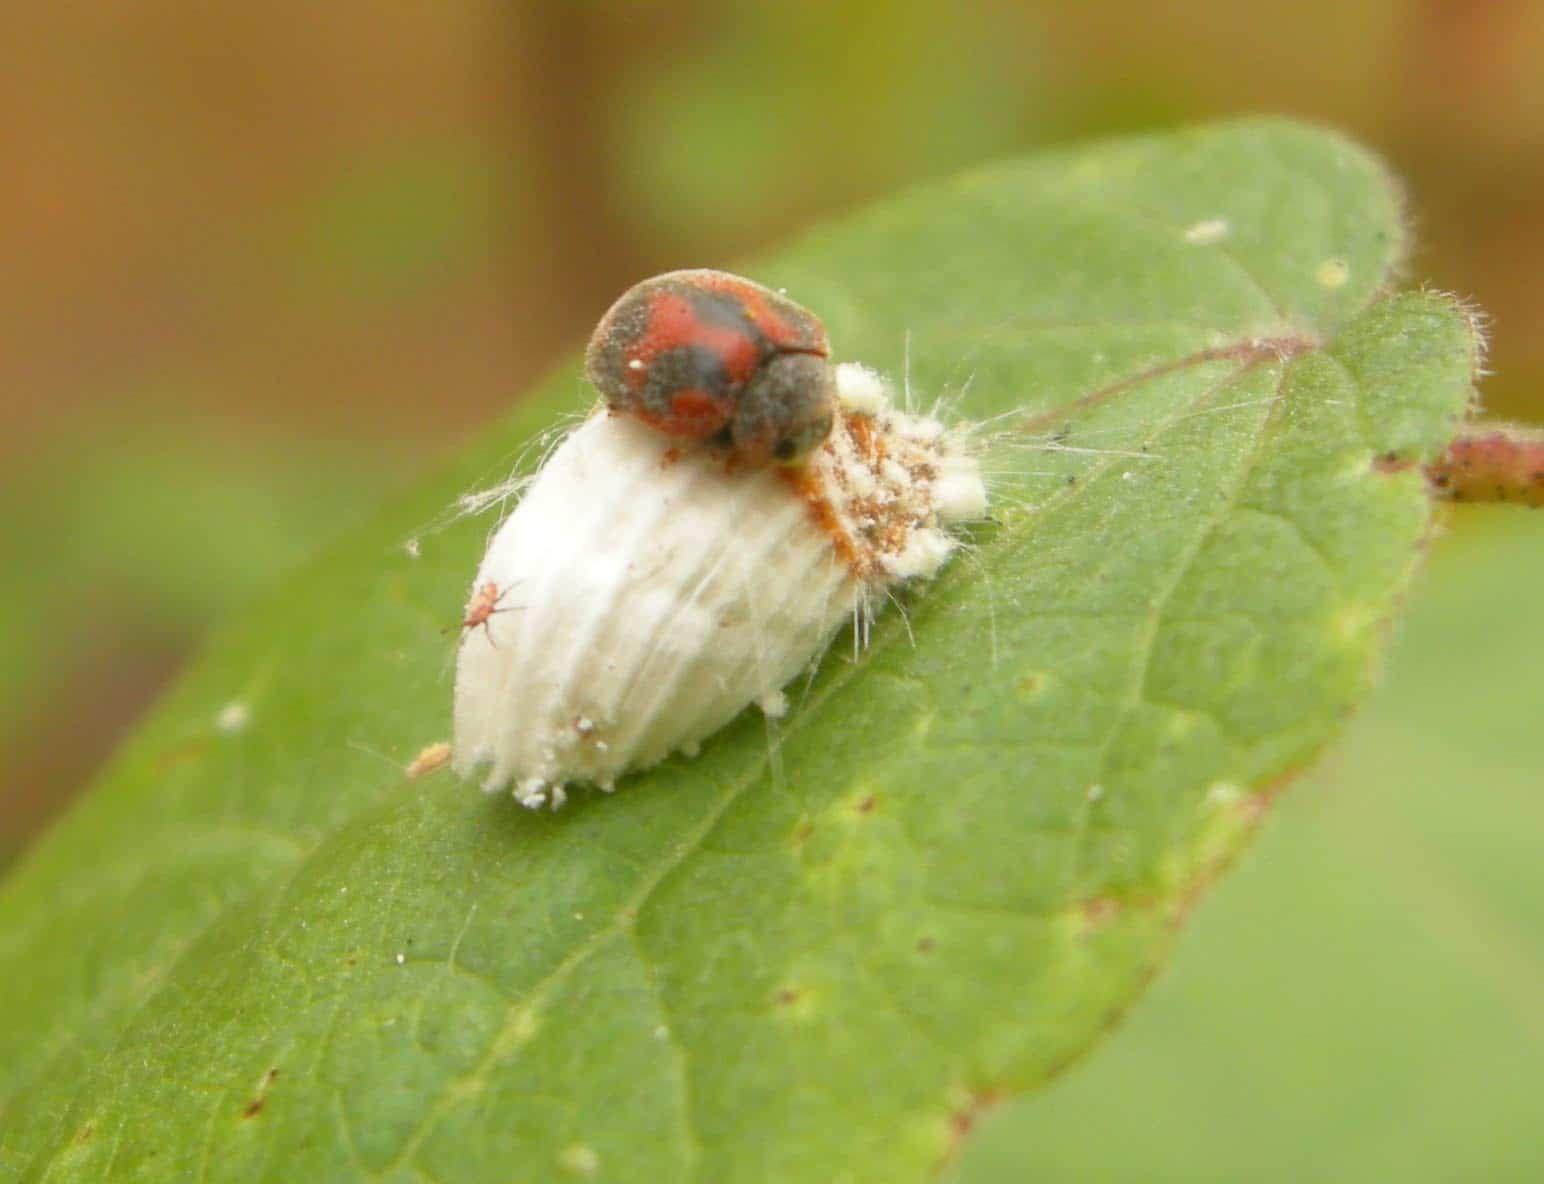 Cochinilla algodonosa tratamiento ecologico